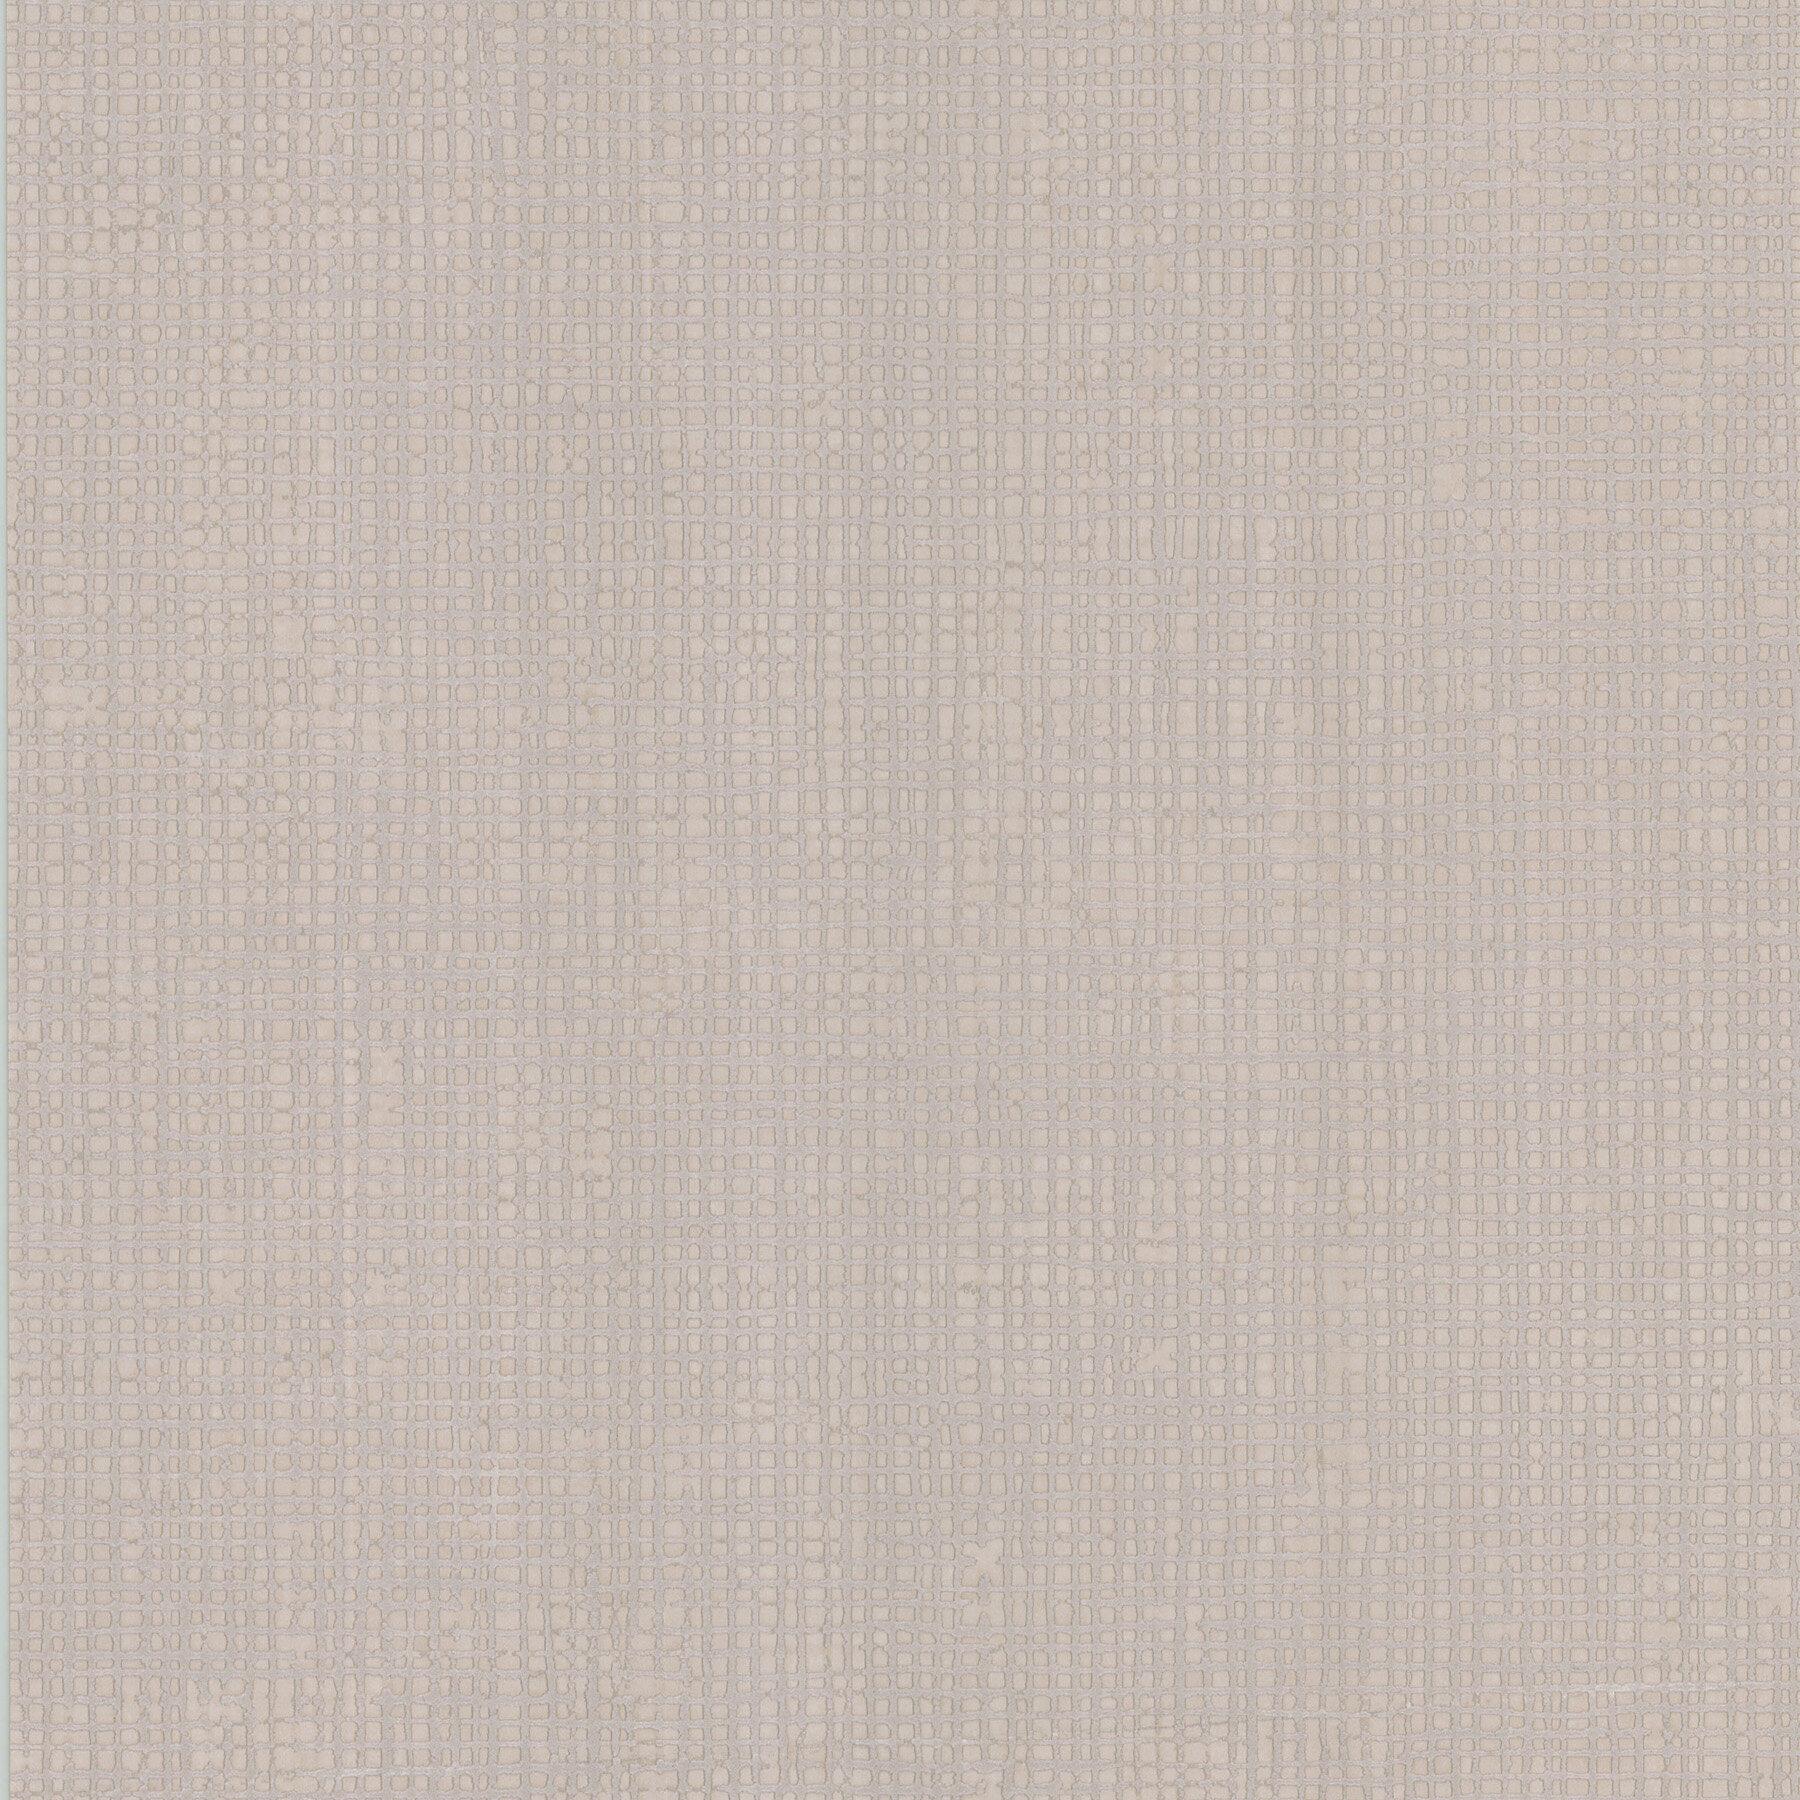 Wallpaper For Kitchen Texture: Kitchen & Bath Resource III Jenkins Small Tile Stripe